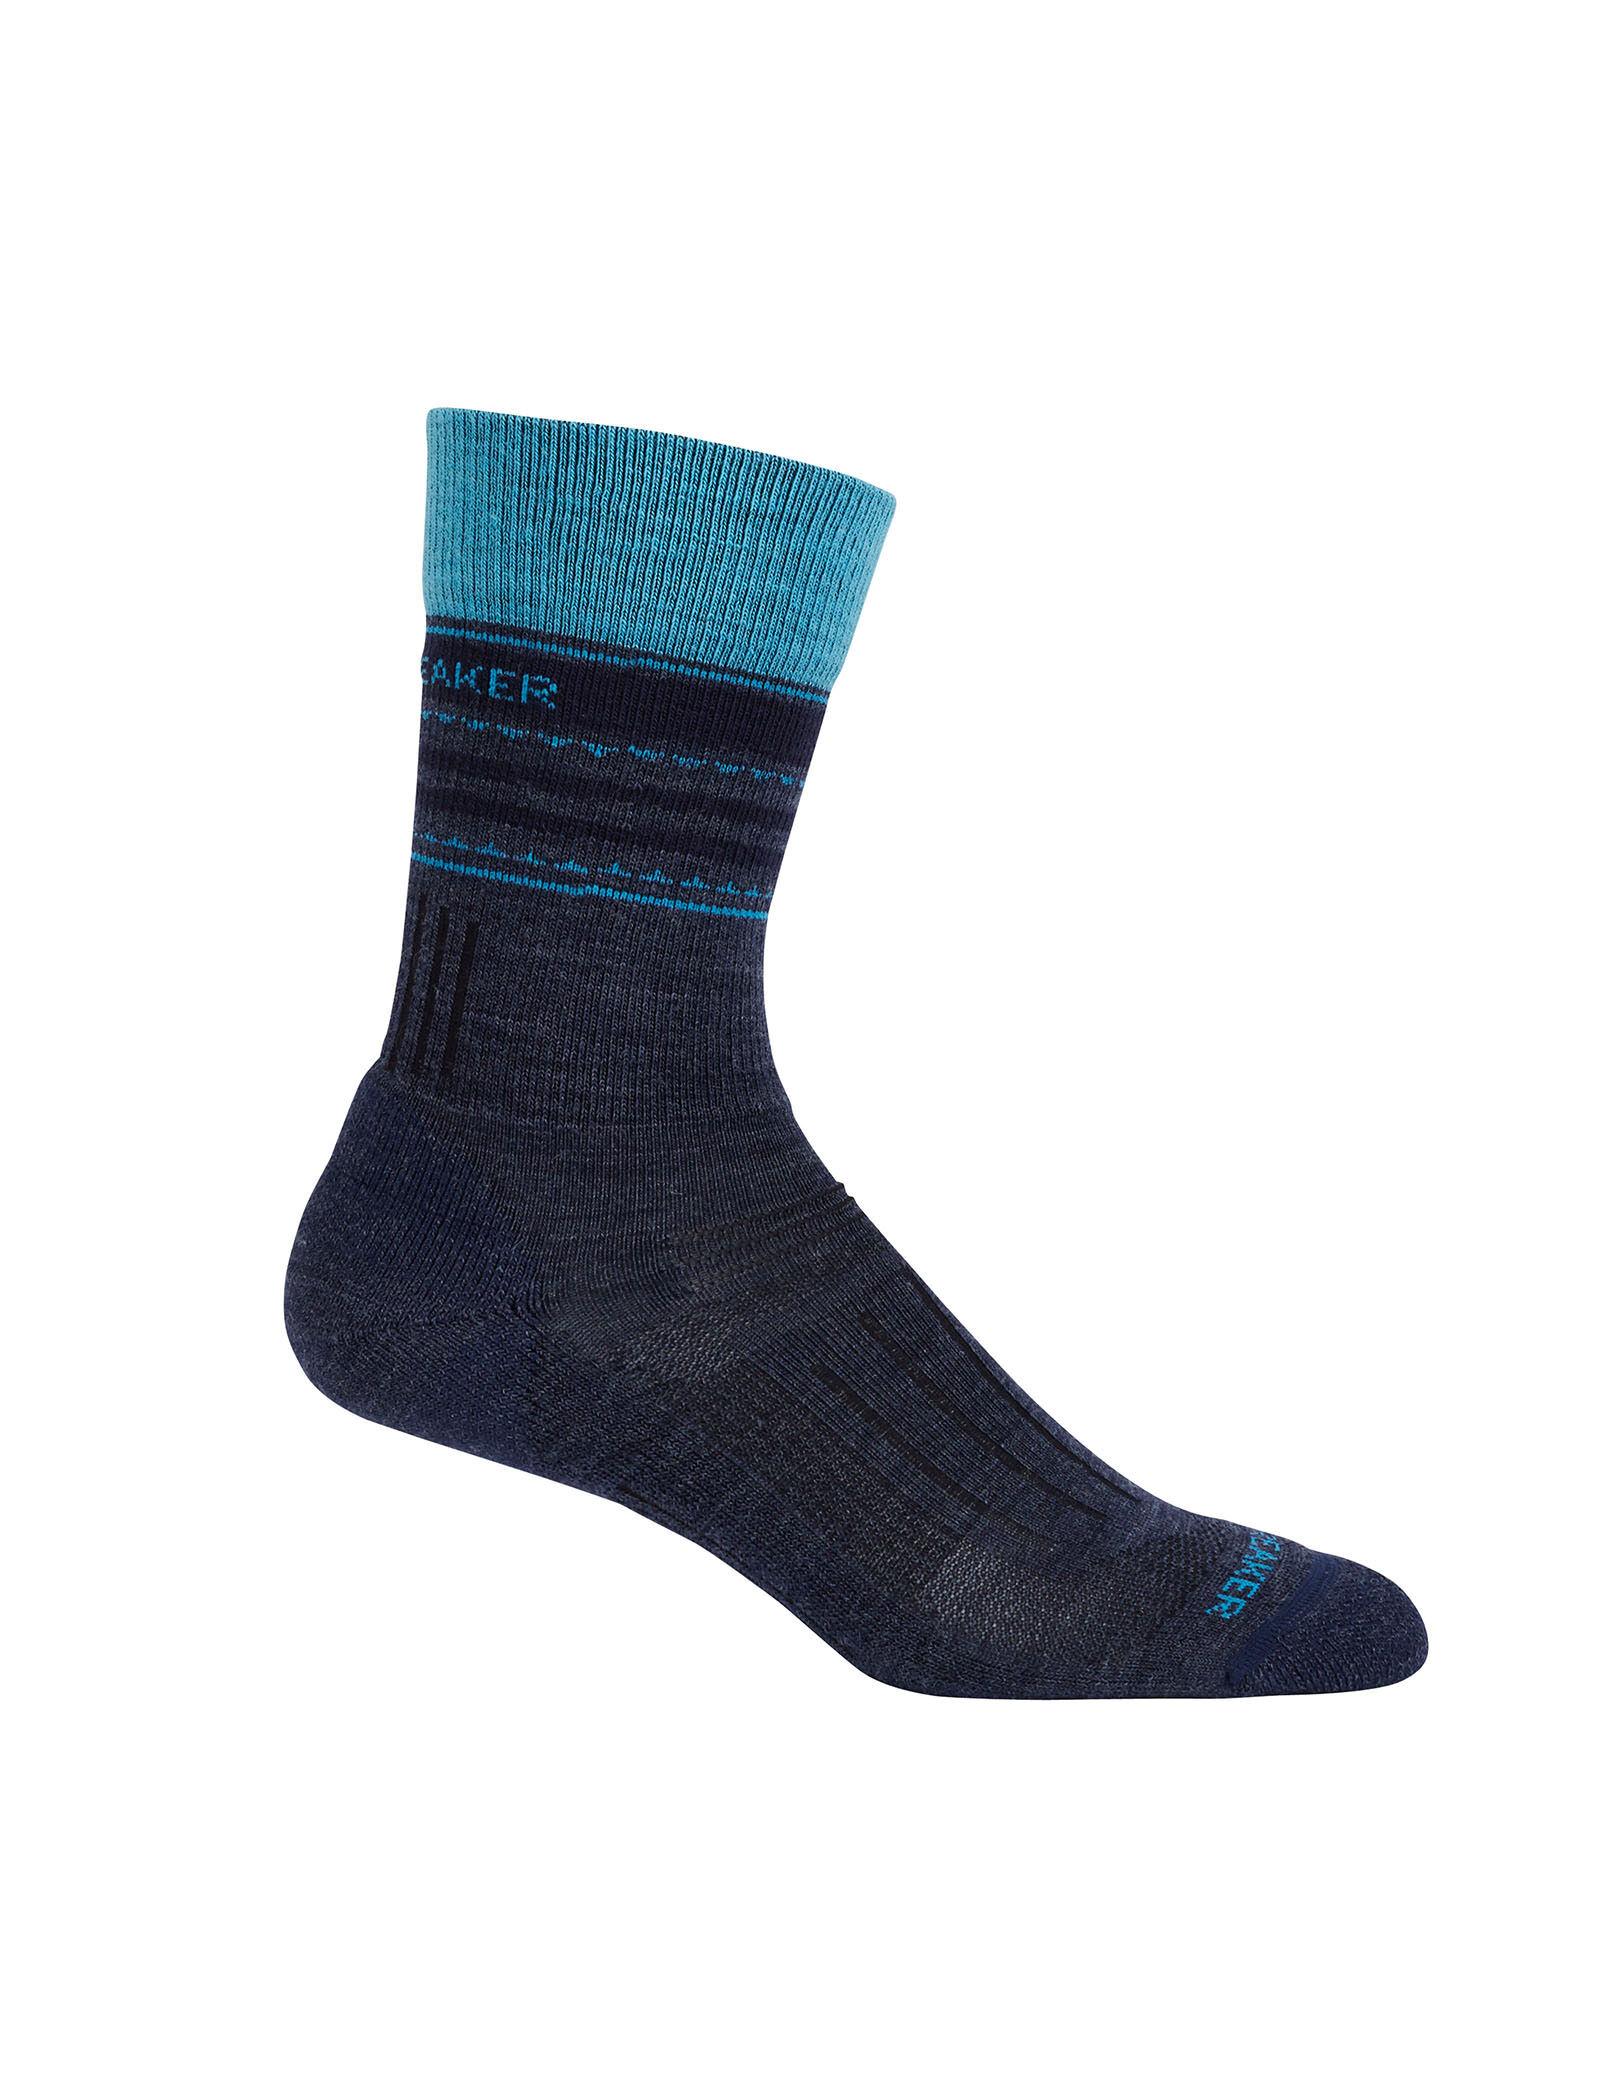 Medium Crew hiking-socks Icebreaker Merino Hike